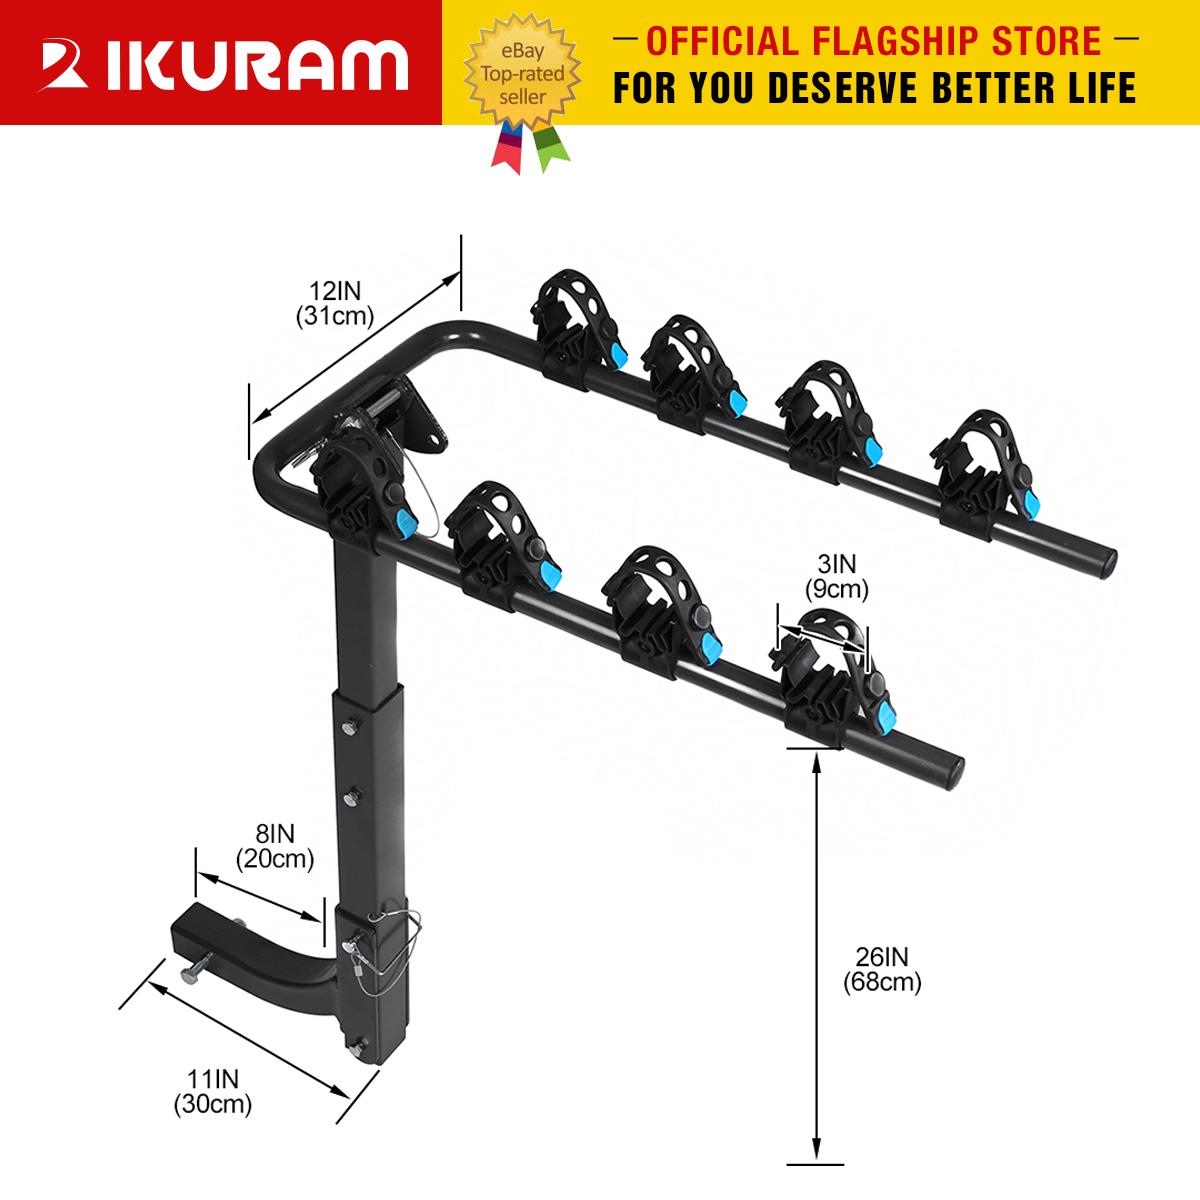 Ikuram 3 Bike Bicycle Rack Carrier 2 Quot Hitch Mount Rack Car